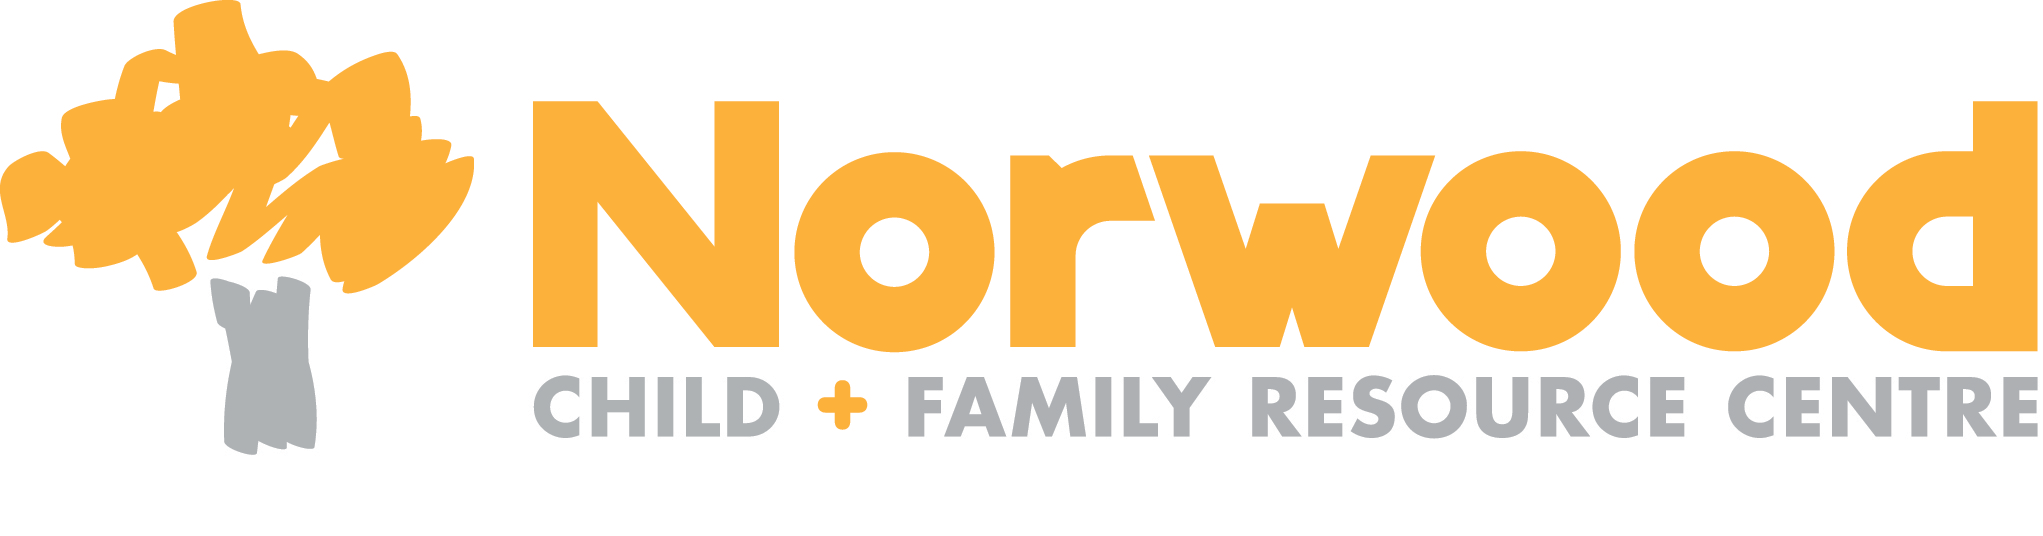 norwood+PLC_logo_CMYK.png